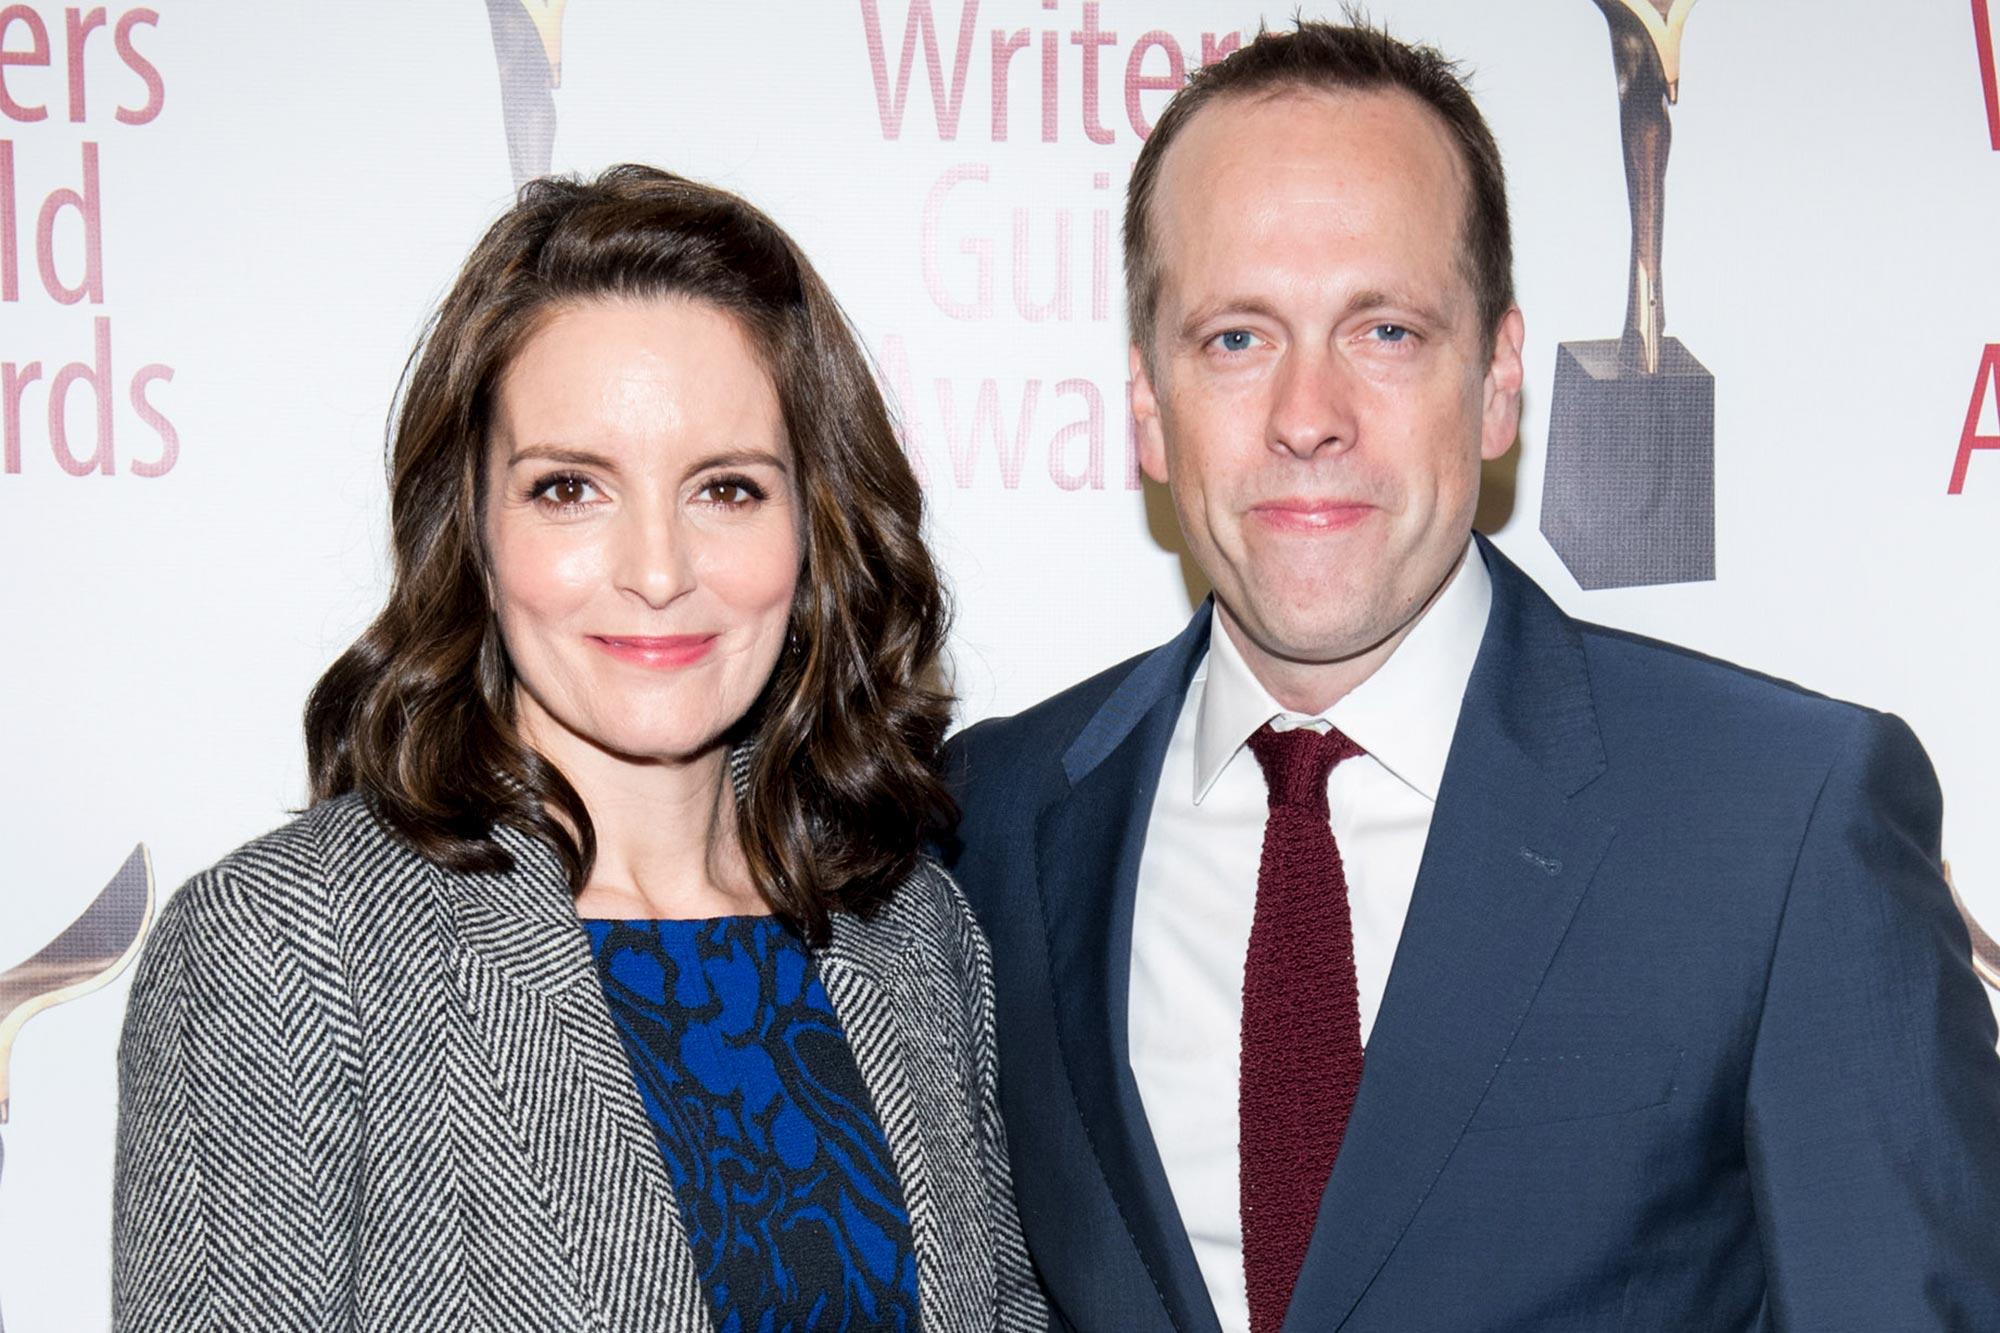 Tina Fey y Robert Carlock desarrollarán una comedia animada para Netflix